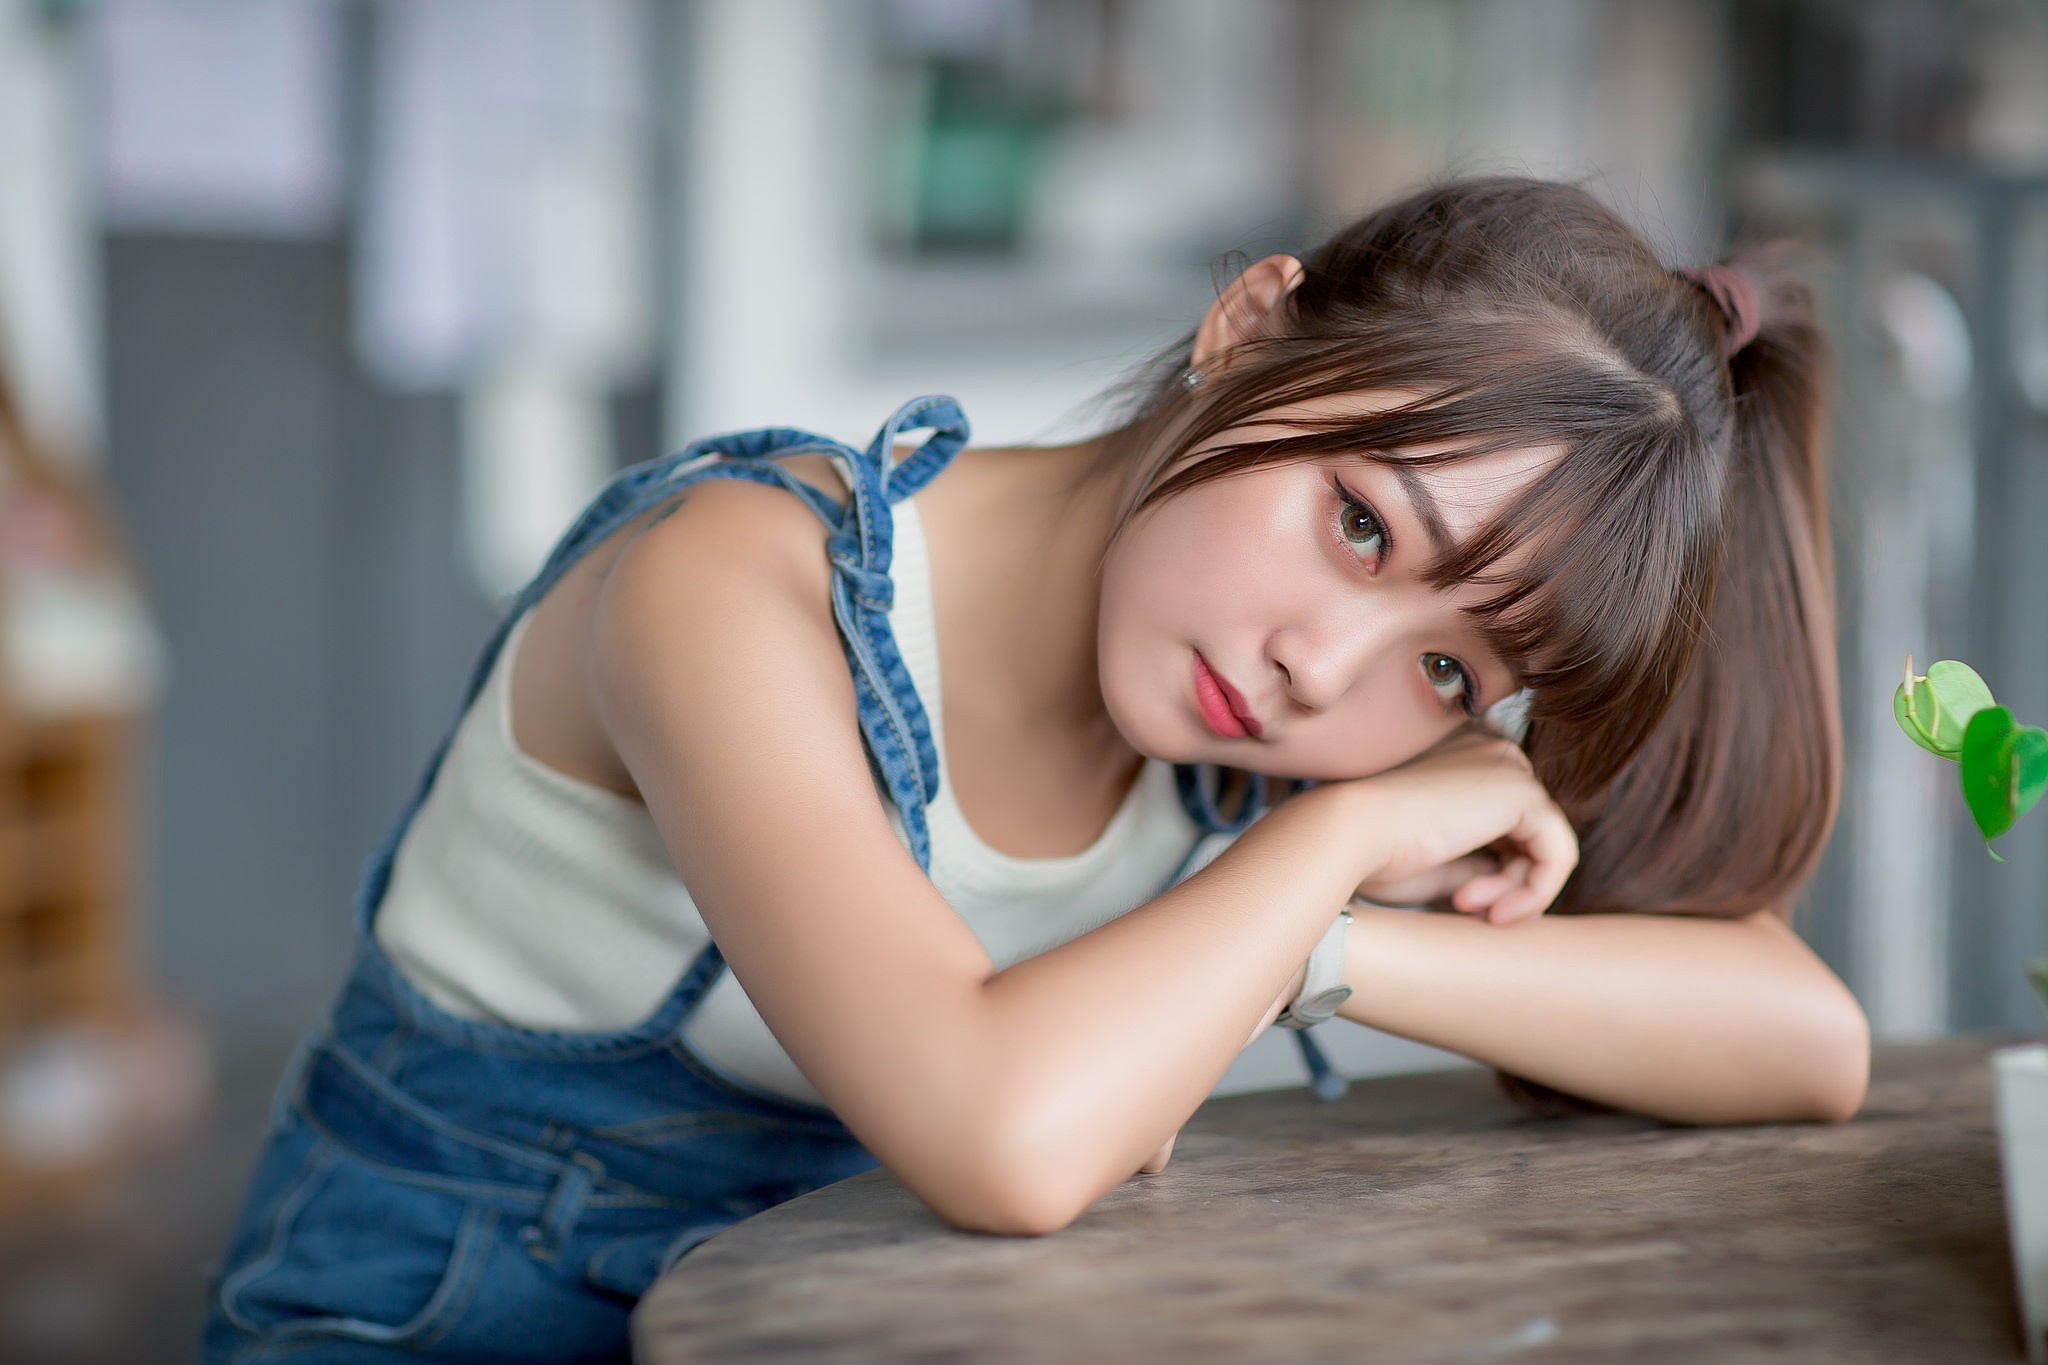 Asian Brunette Depth Of Field Girl Lipstick Model Woman 2048x1365